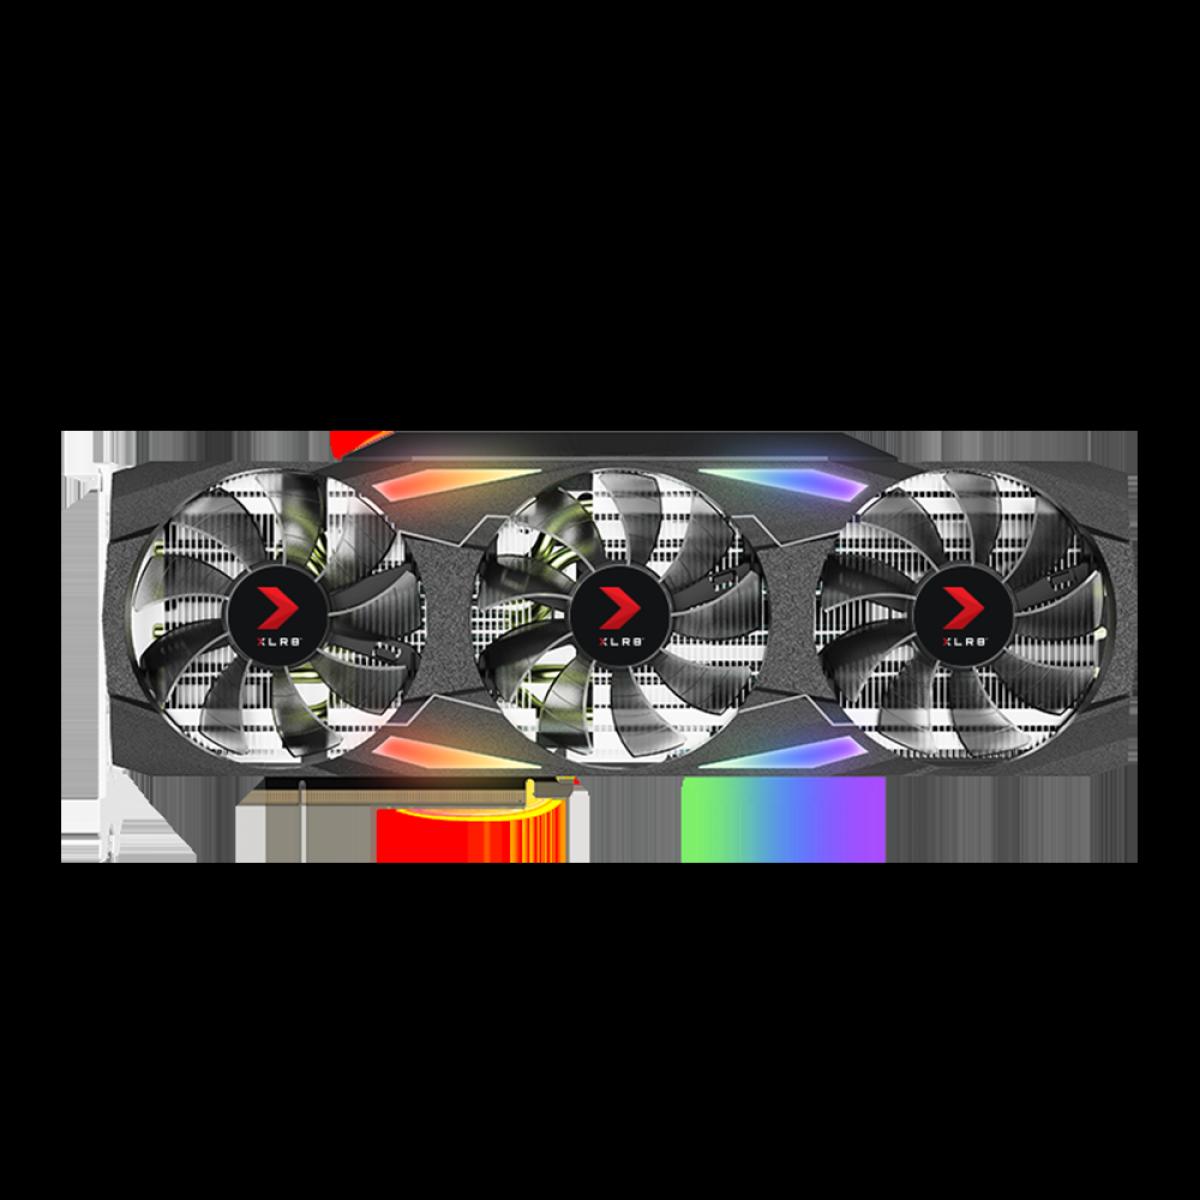 Placa de Vídeo PNY GeForce RTX 3080 XLR8 Gaming EPIC-X RGB Triple, 10GB, GDDR6X, 320Bit, VCG308010TFXMPB